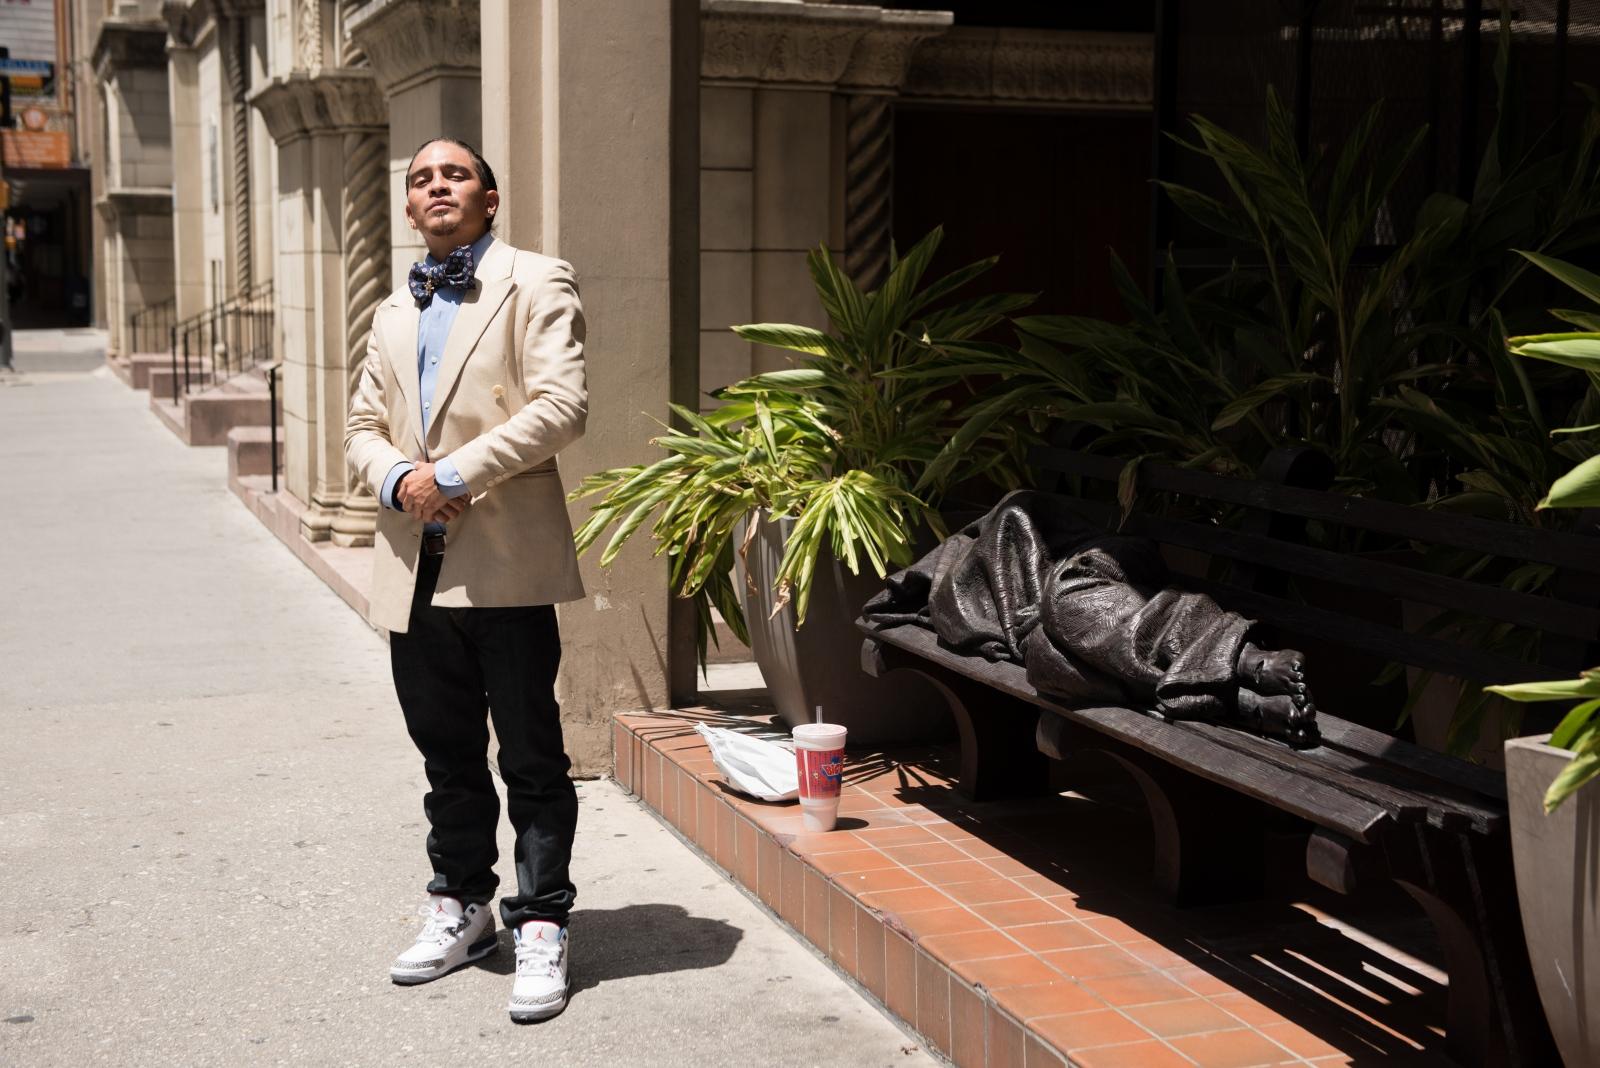 The barber and Homeless Jesus. San Antonio, Texas, June 2017.